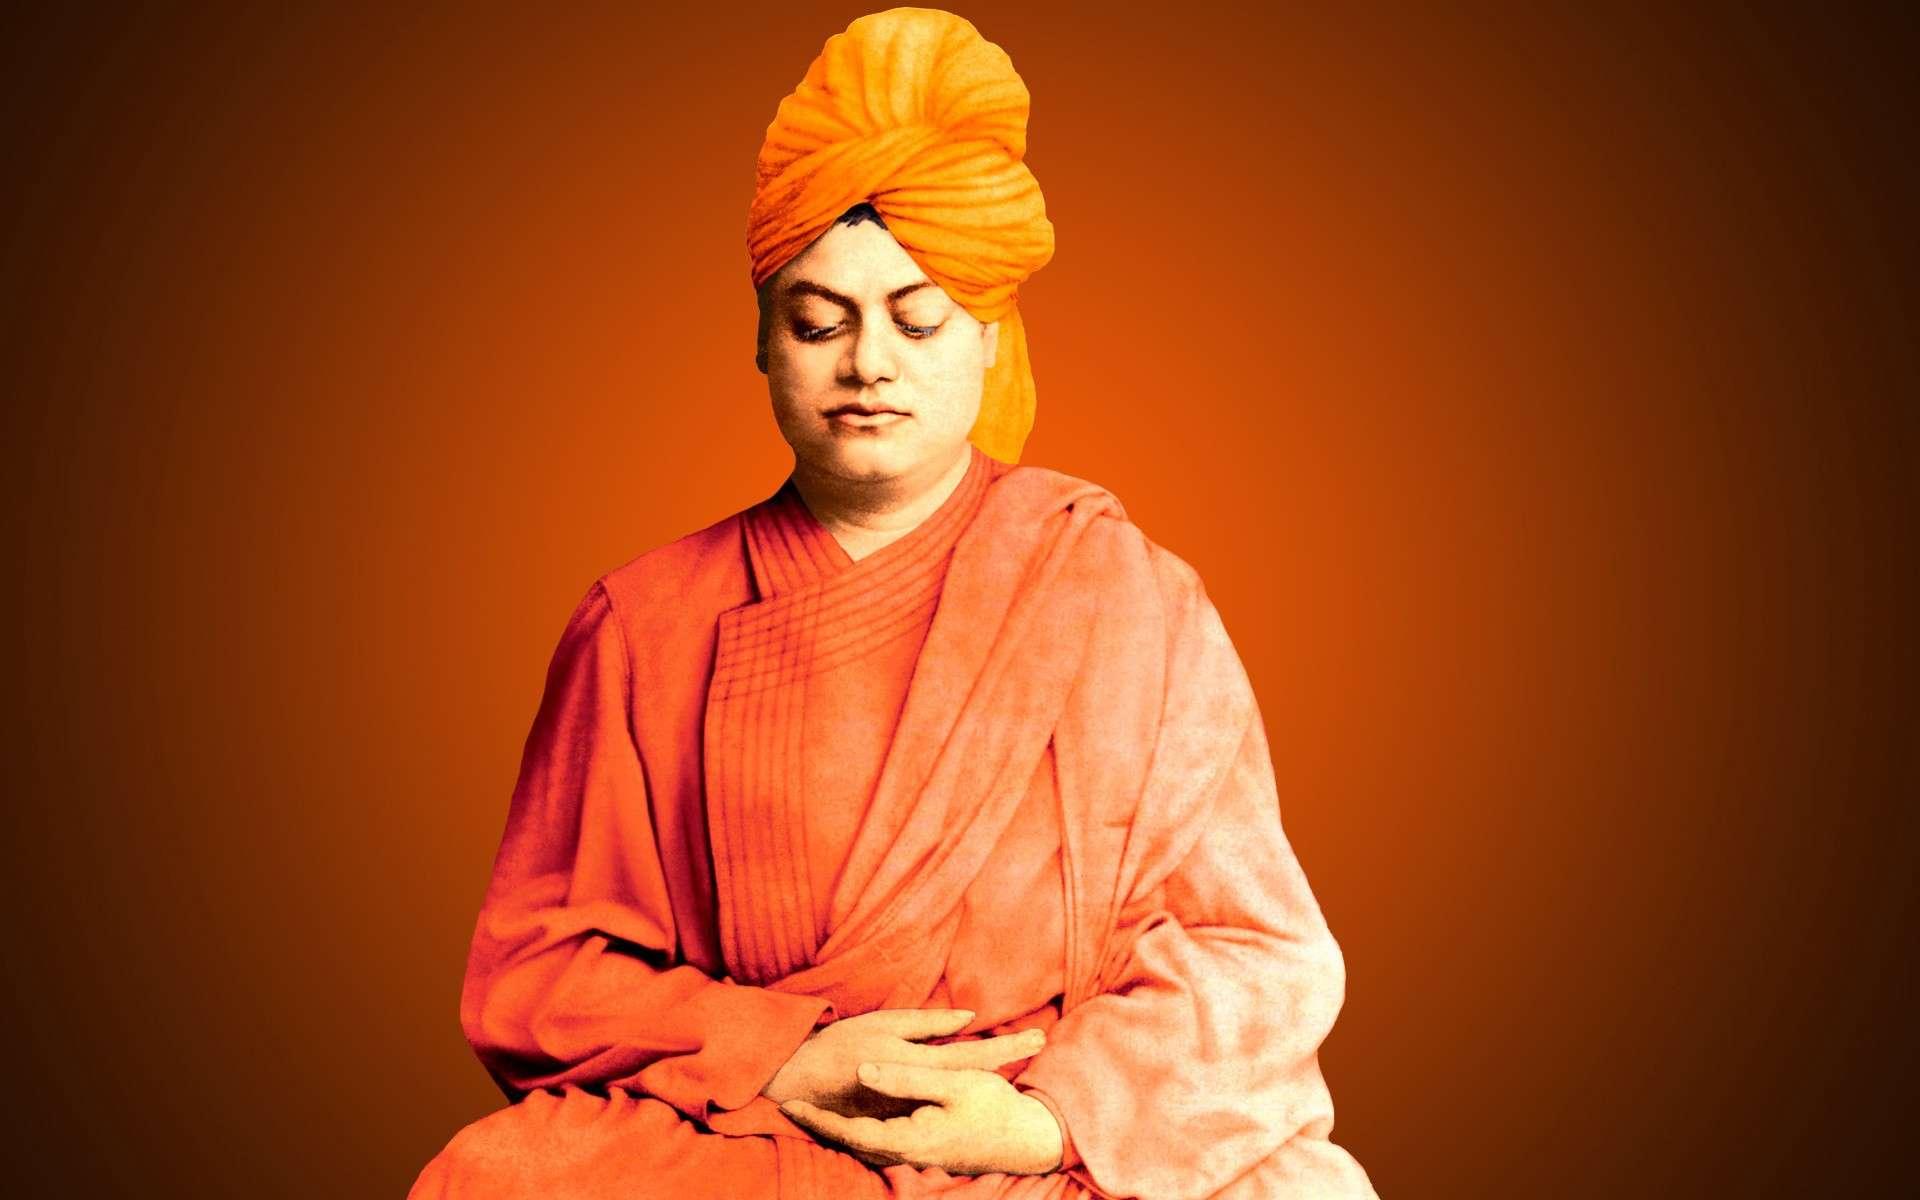 Swami Vivekananda – The legend inspiring generations | Business Insider  India